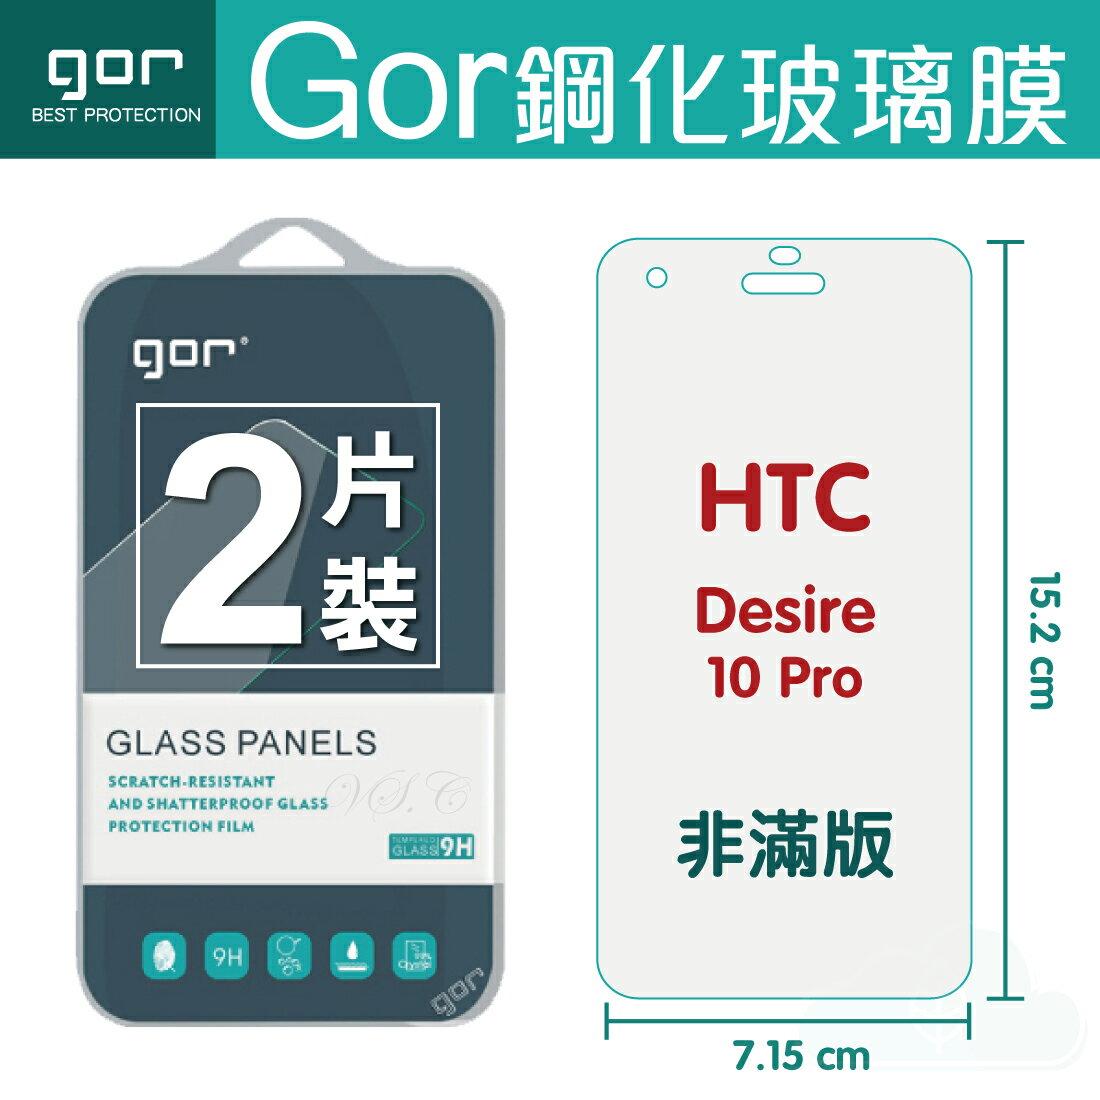 【HTC】GOR 9H HTC Desire 10 Pro 鋼化 玻璃 保護貼 全透明非滿版 兩片裝 【全館滿299免運費】